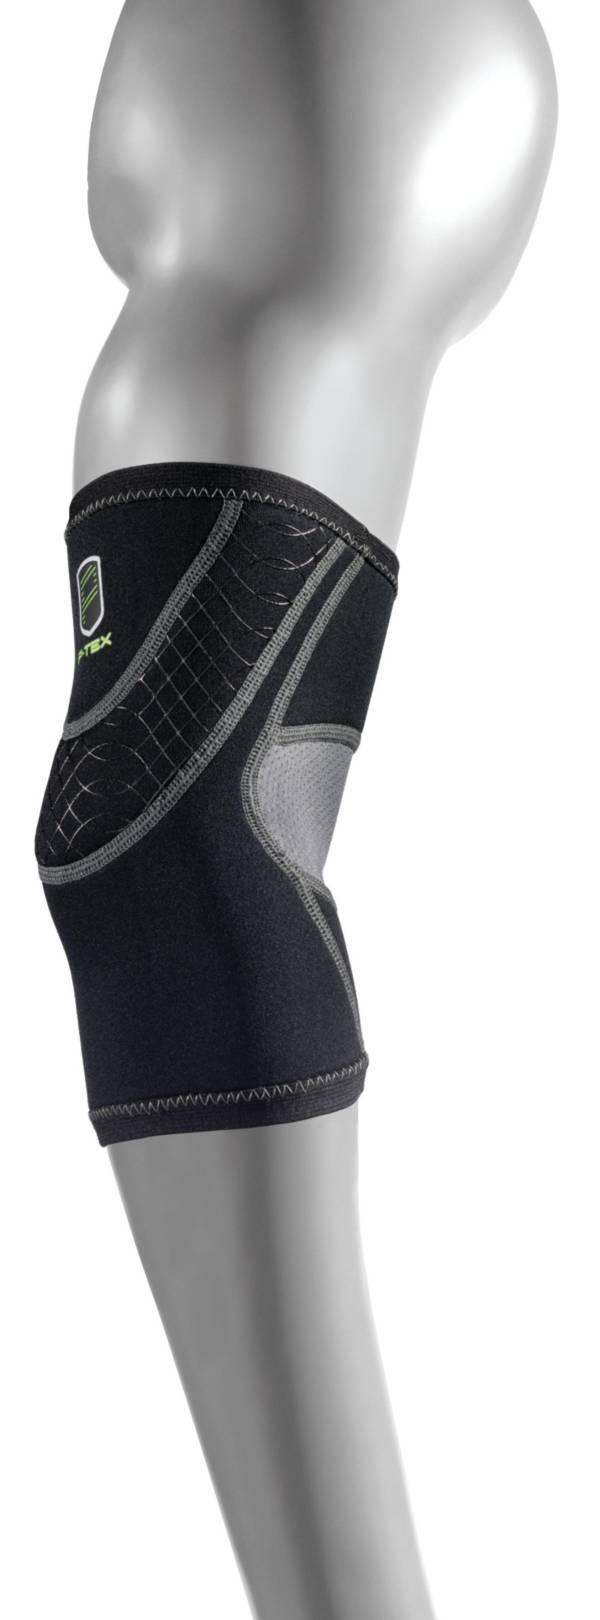 P-TEX Pro Elbow Sleeve product image